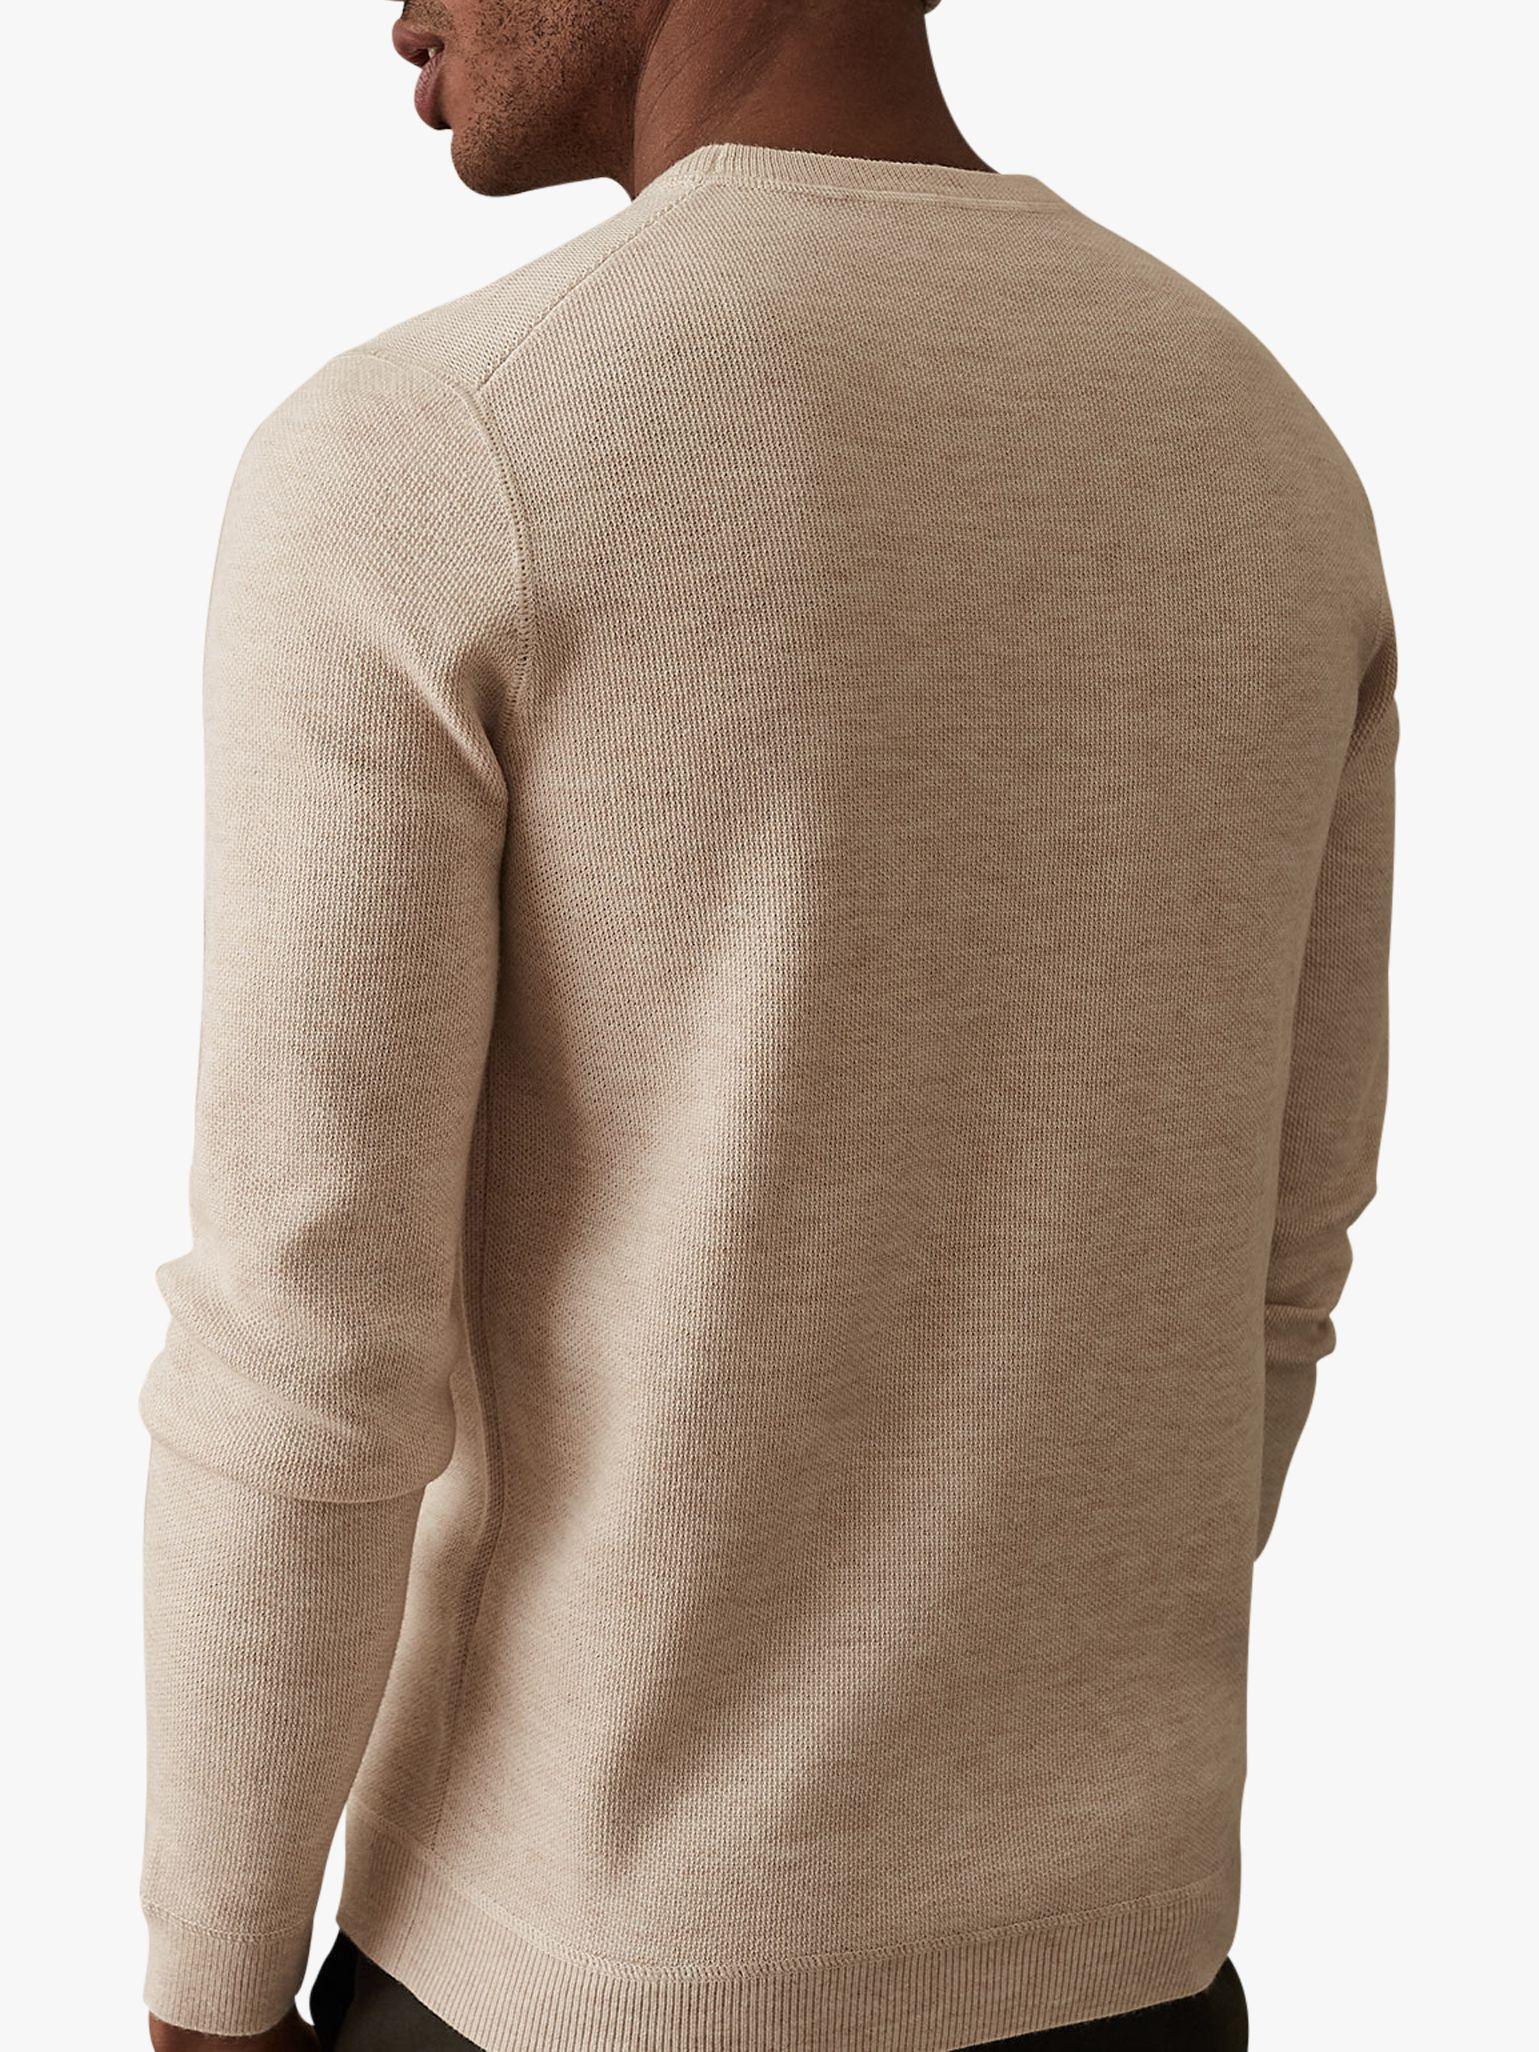 1356a1d9db6 Reiss Dakota Long Sleeve Honeycomb Jumper for Men - Lyst